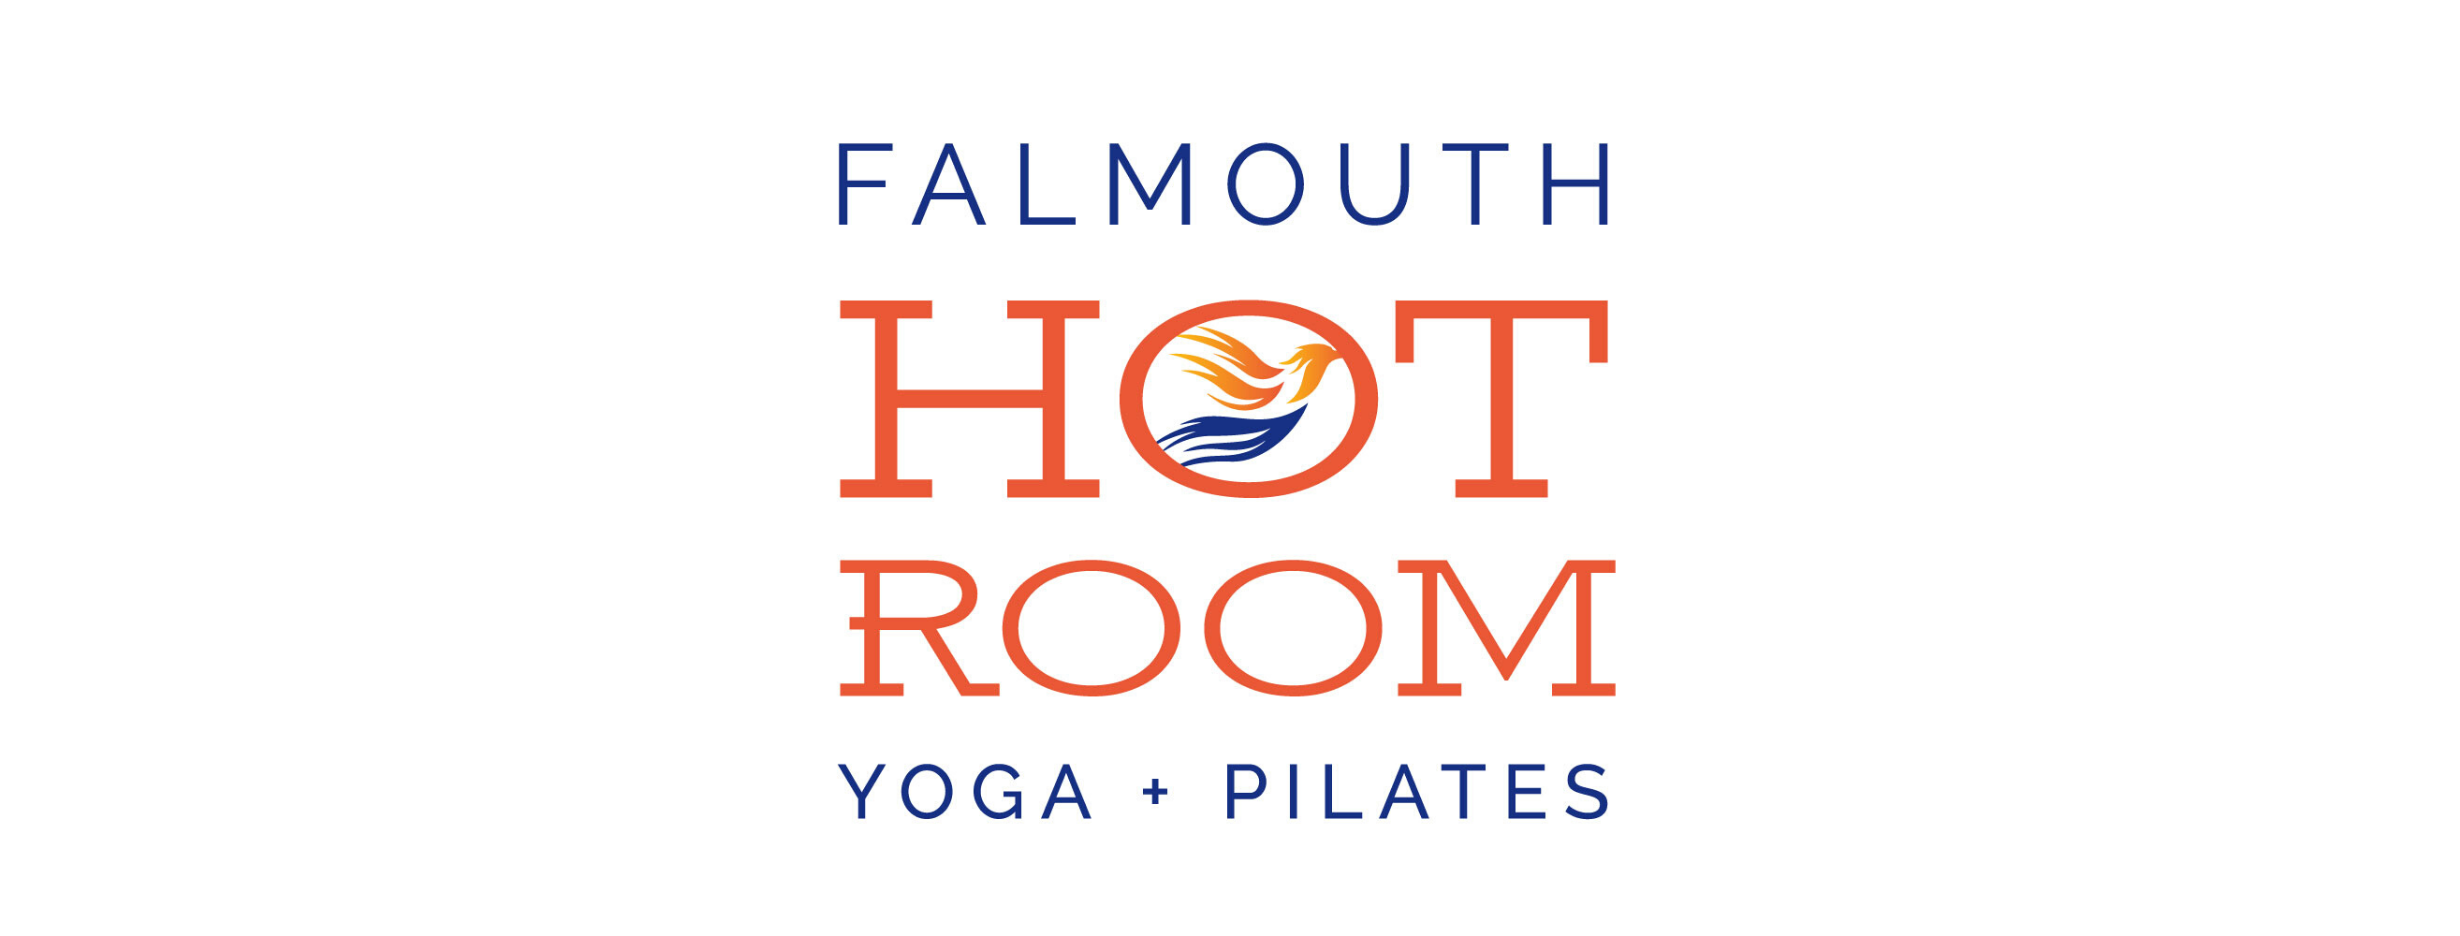 Falmouth Hot Room